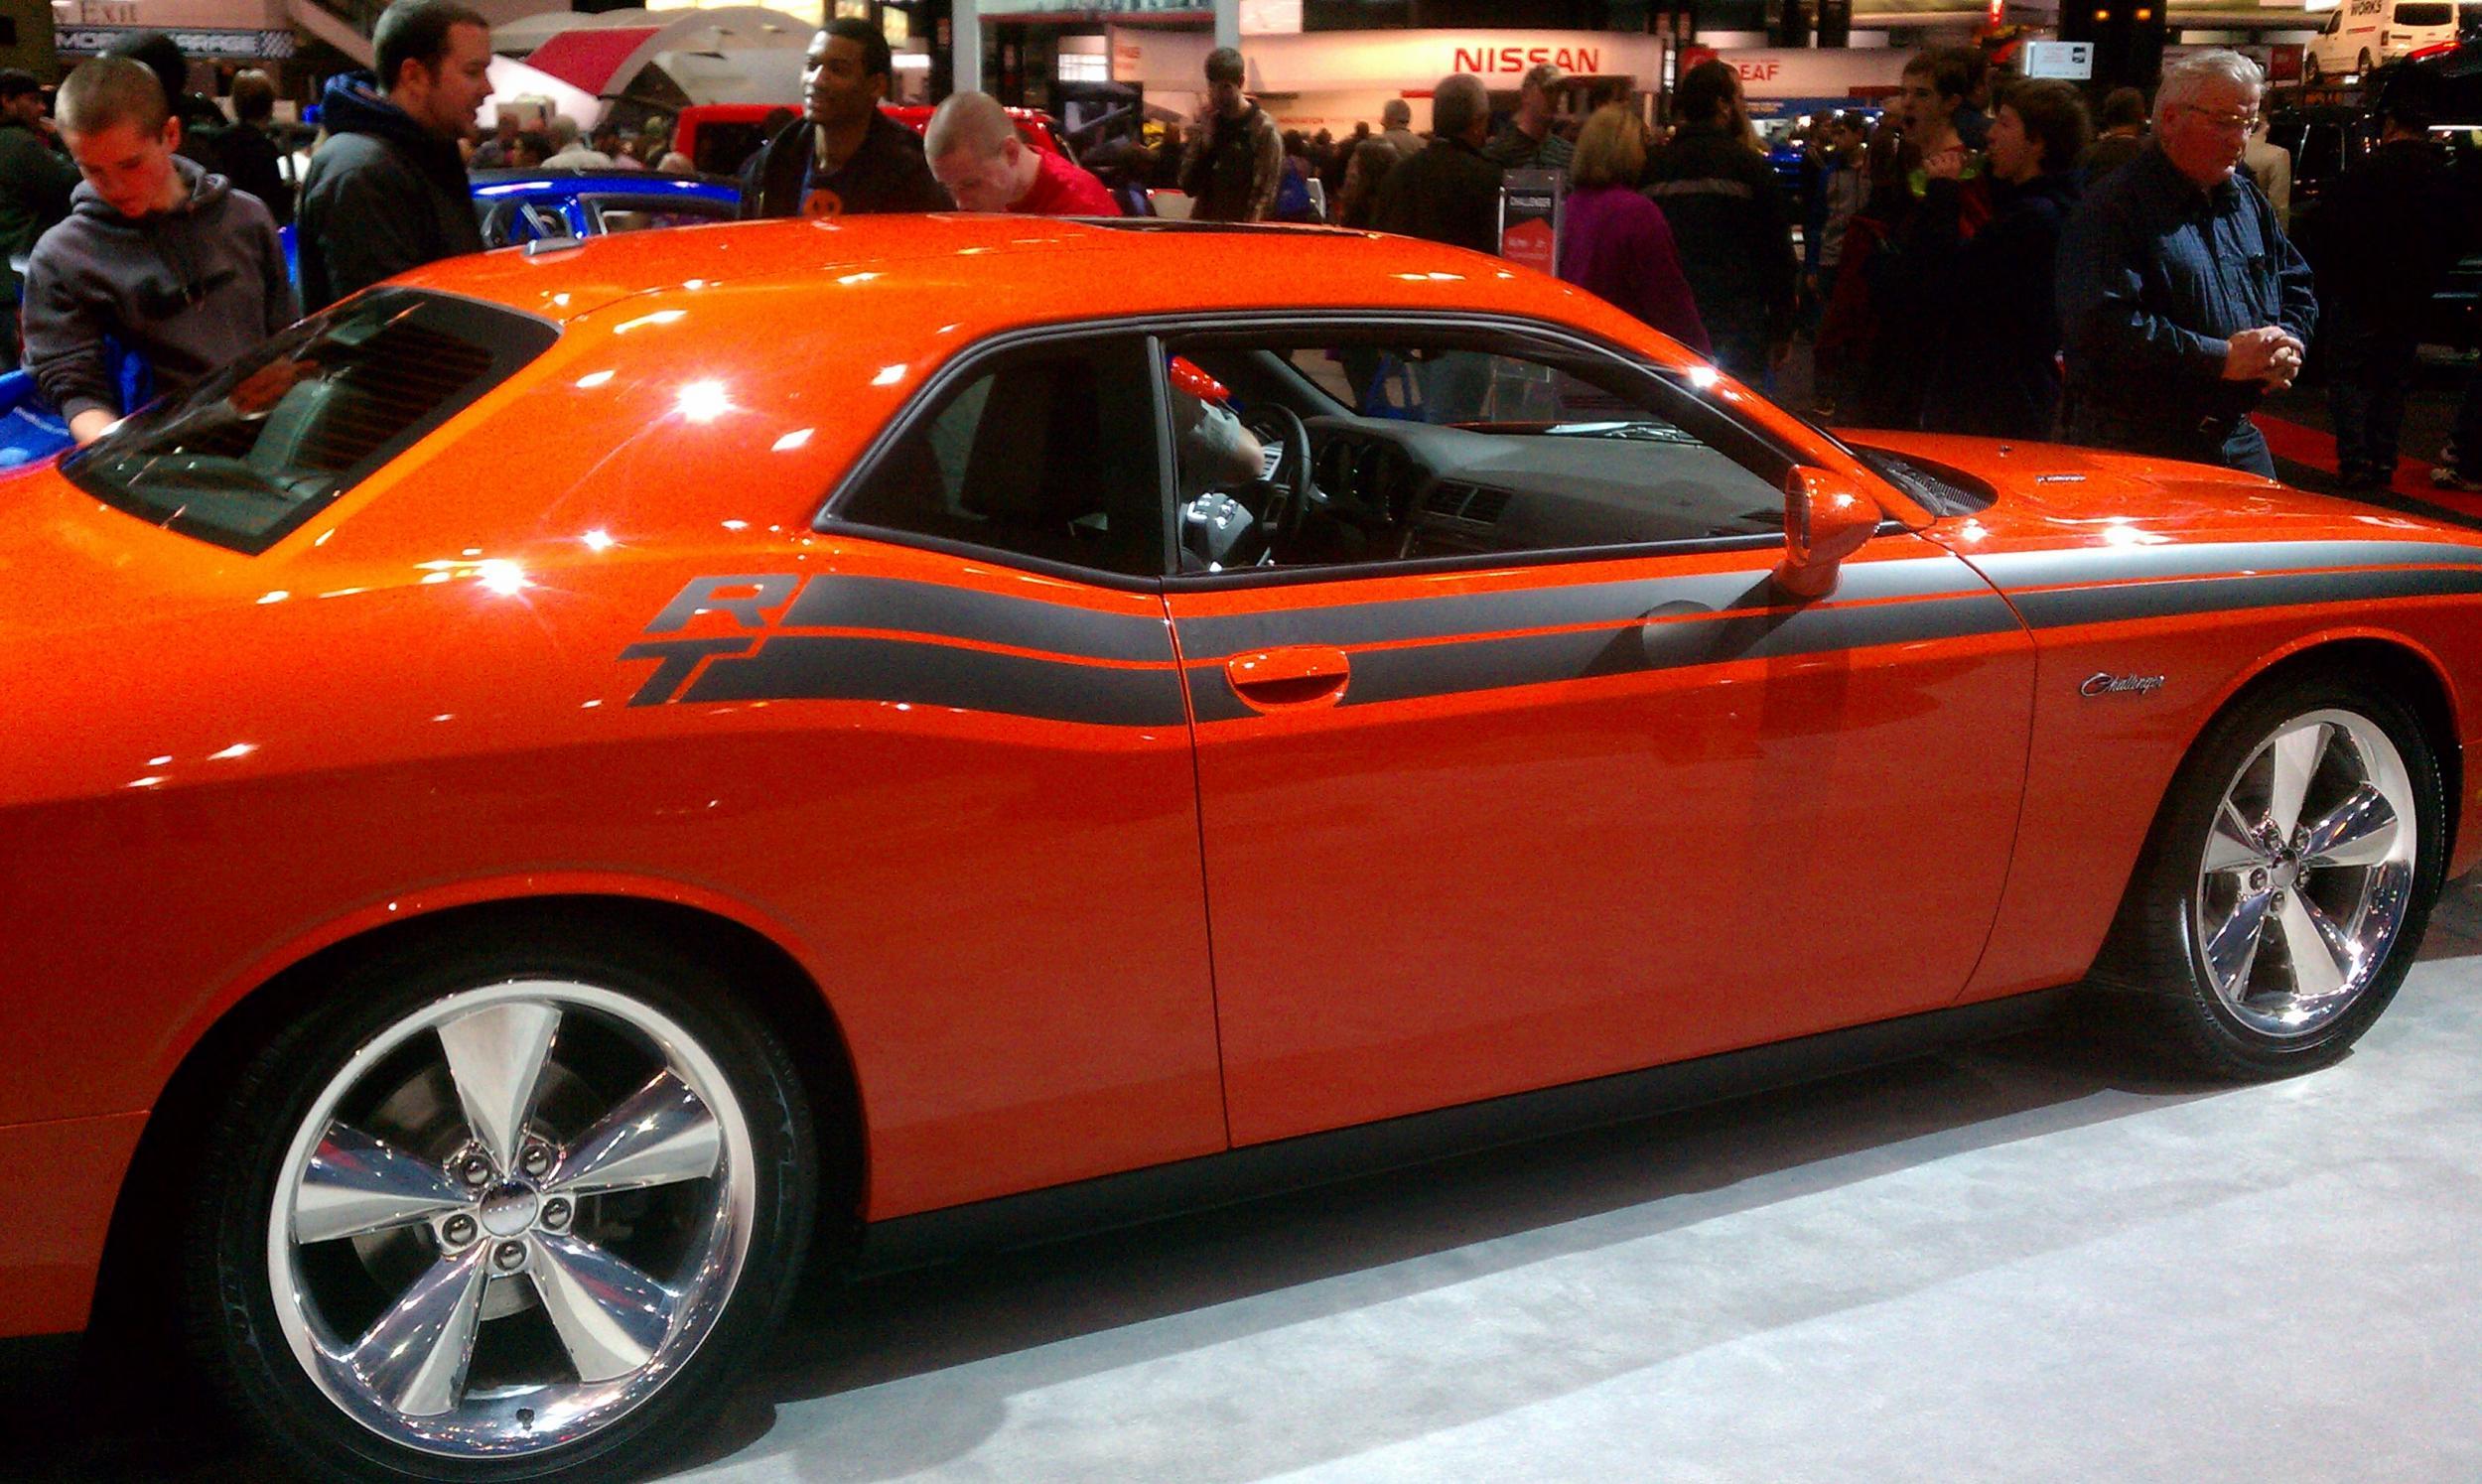 new 2013 Challenger Classic Wheels-imag1036.jpg